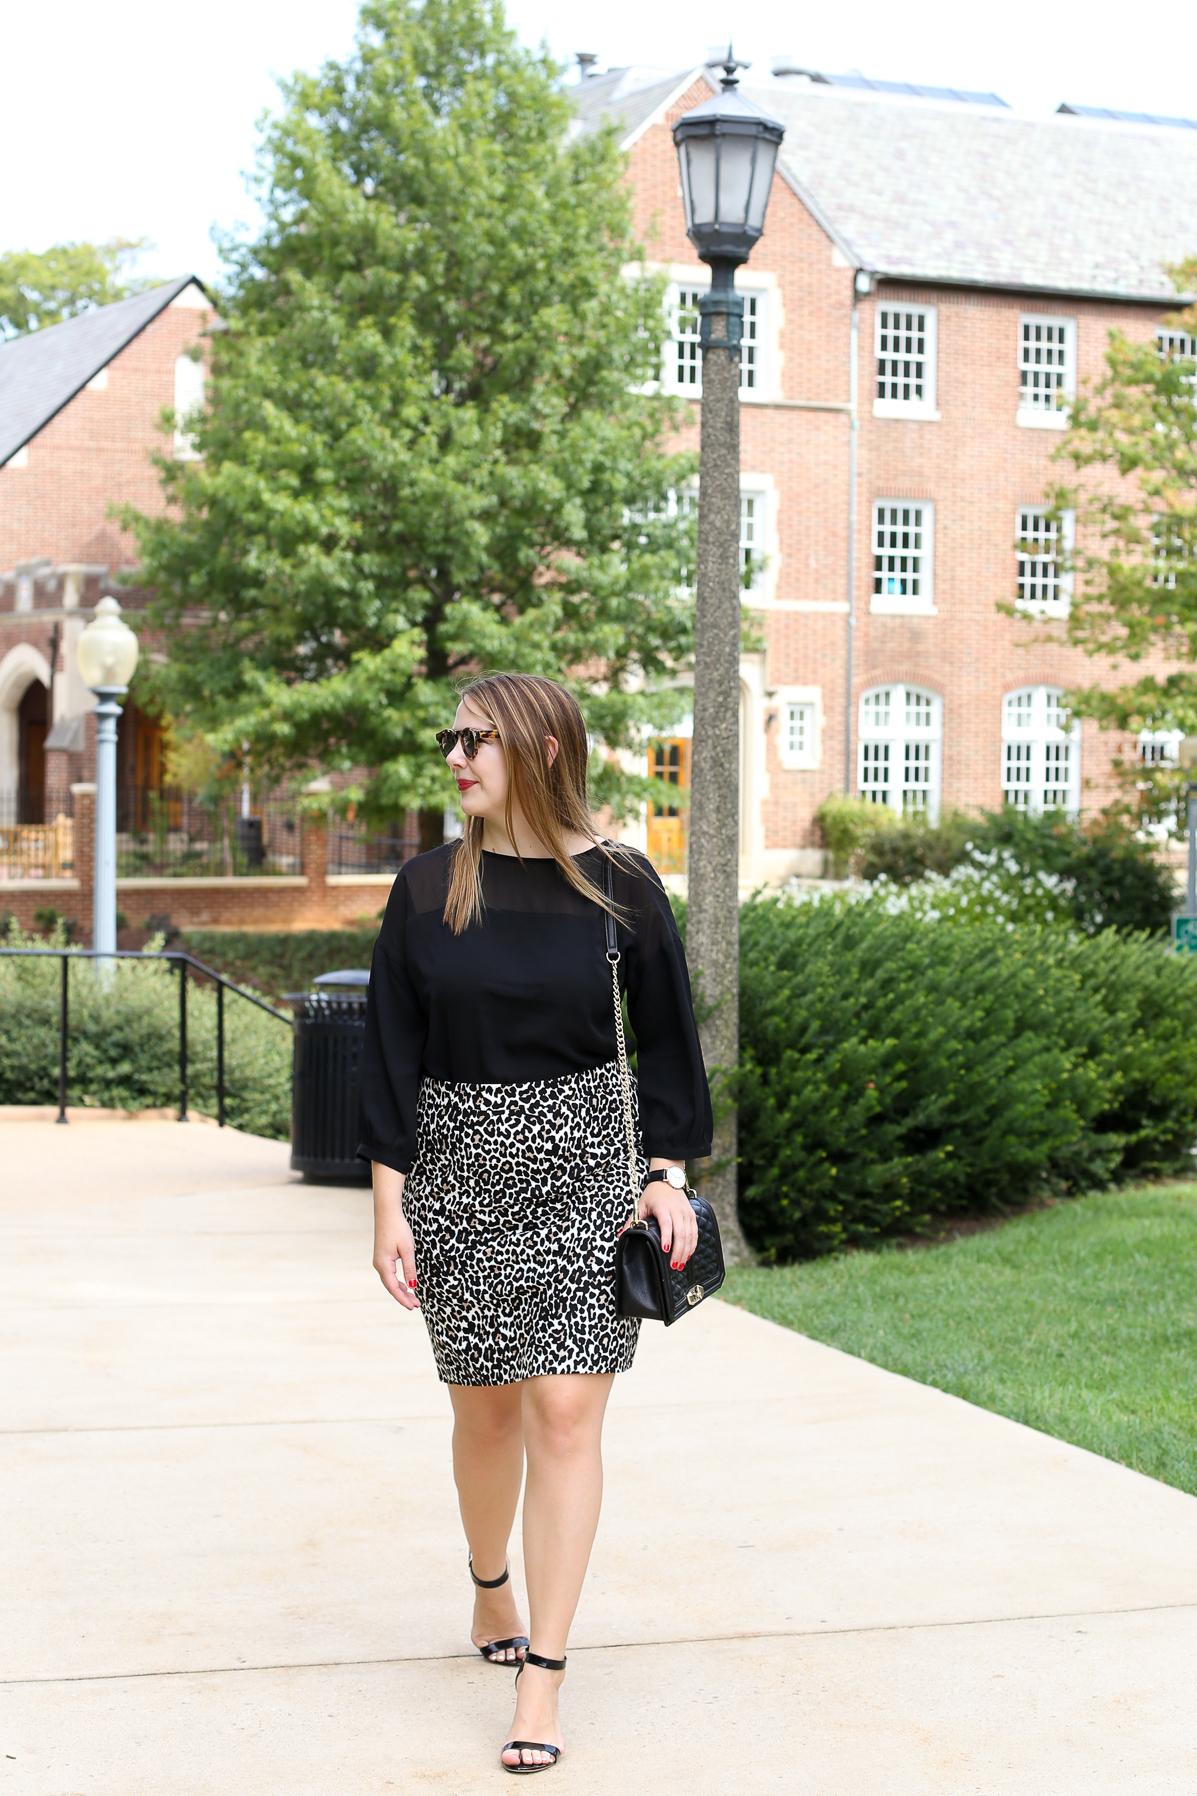 j crew leopard pencil skirt for work